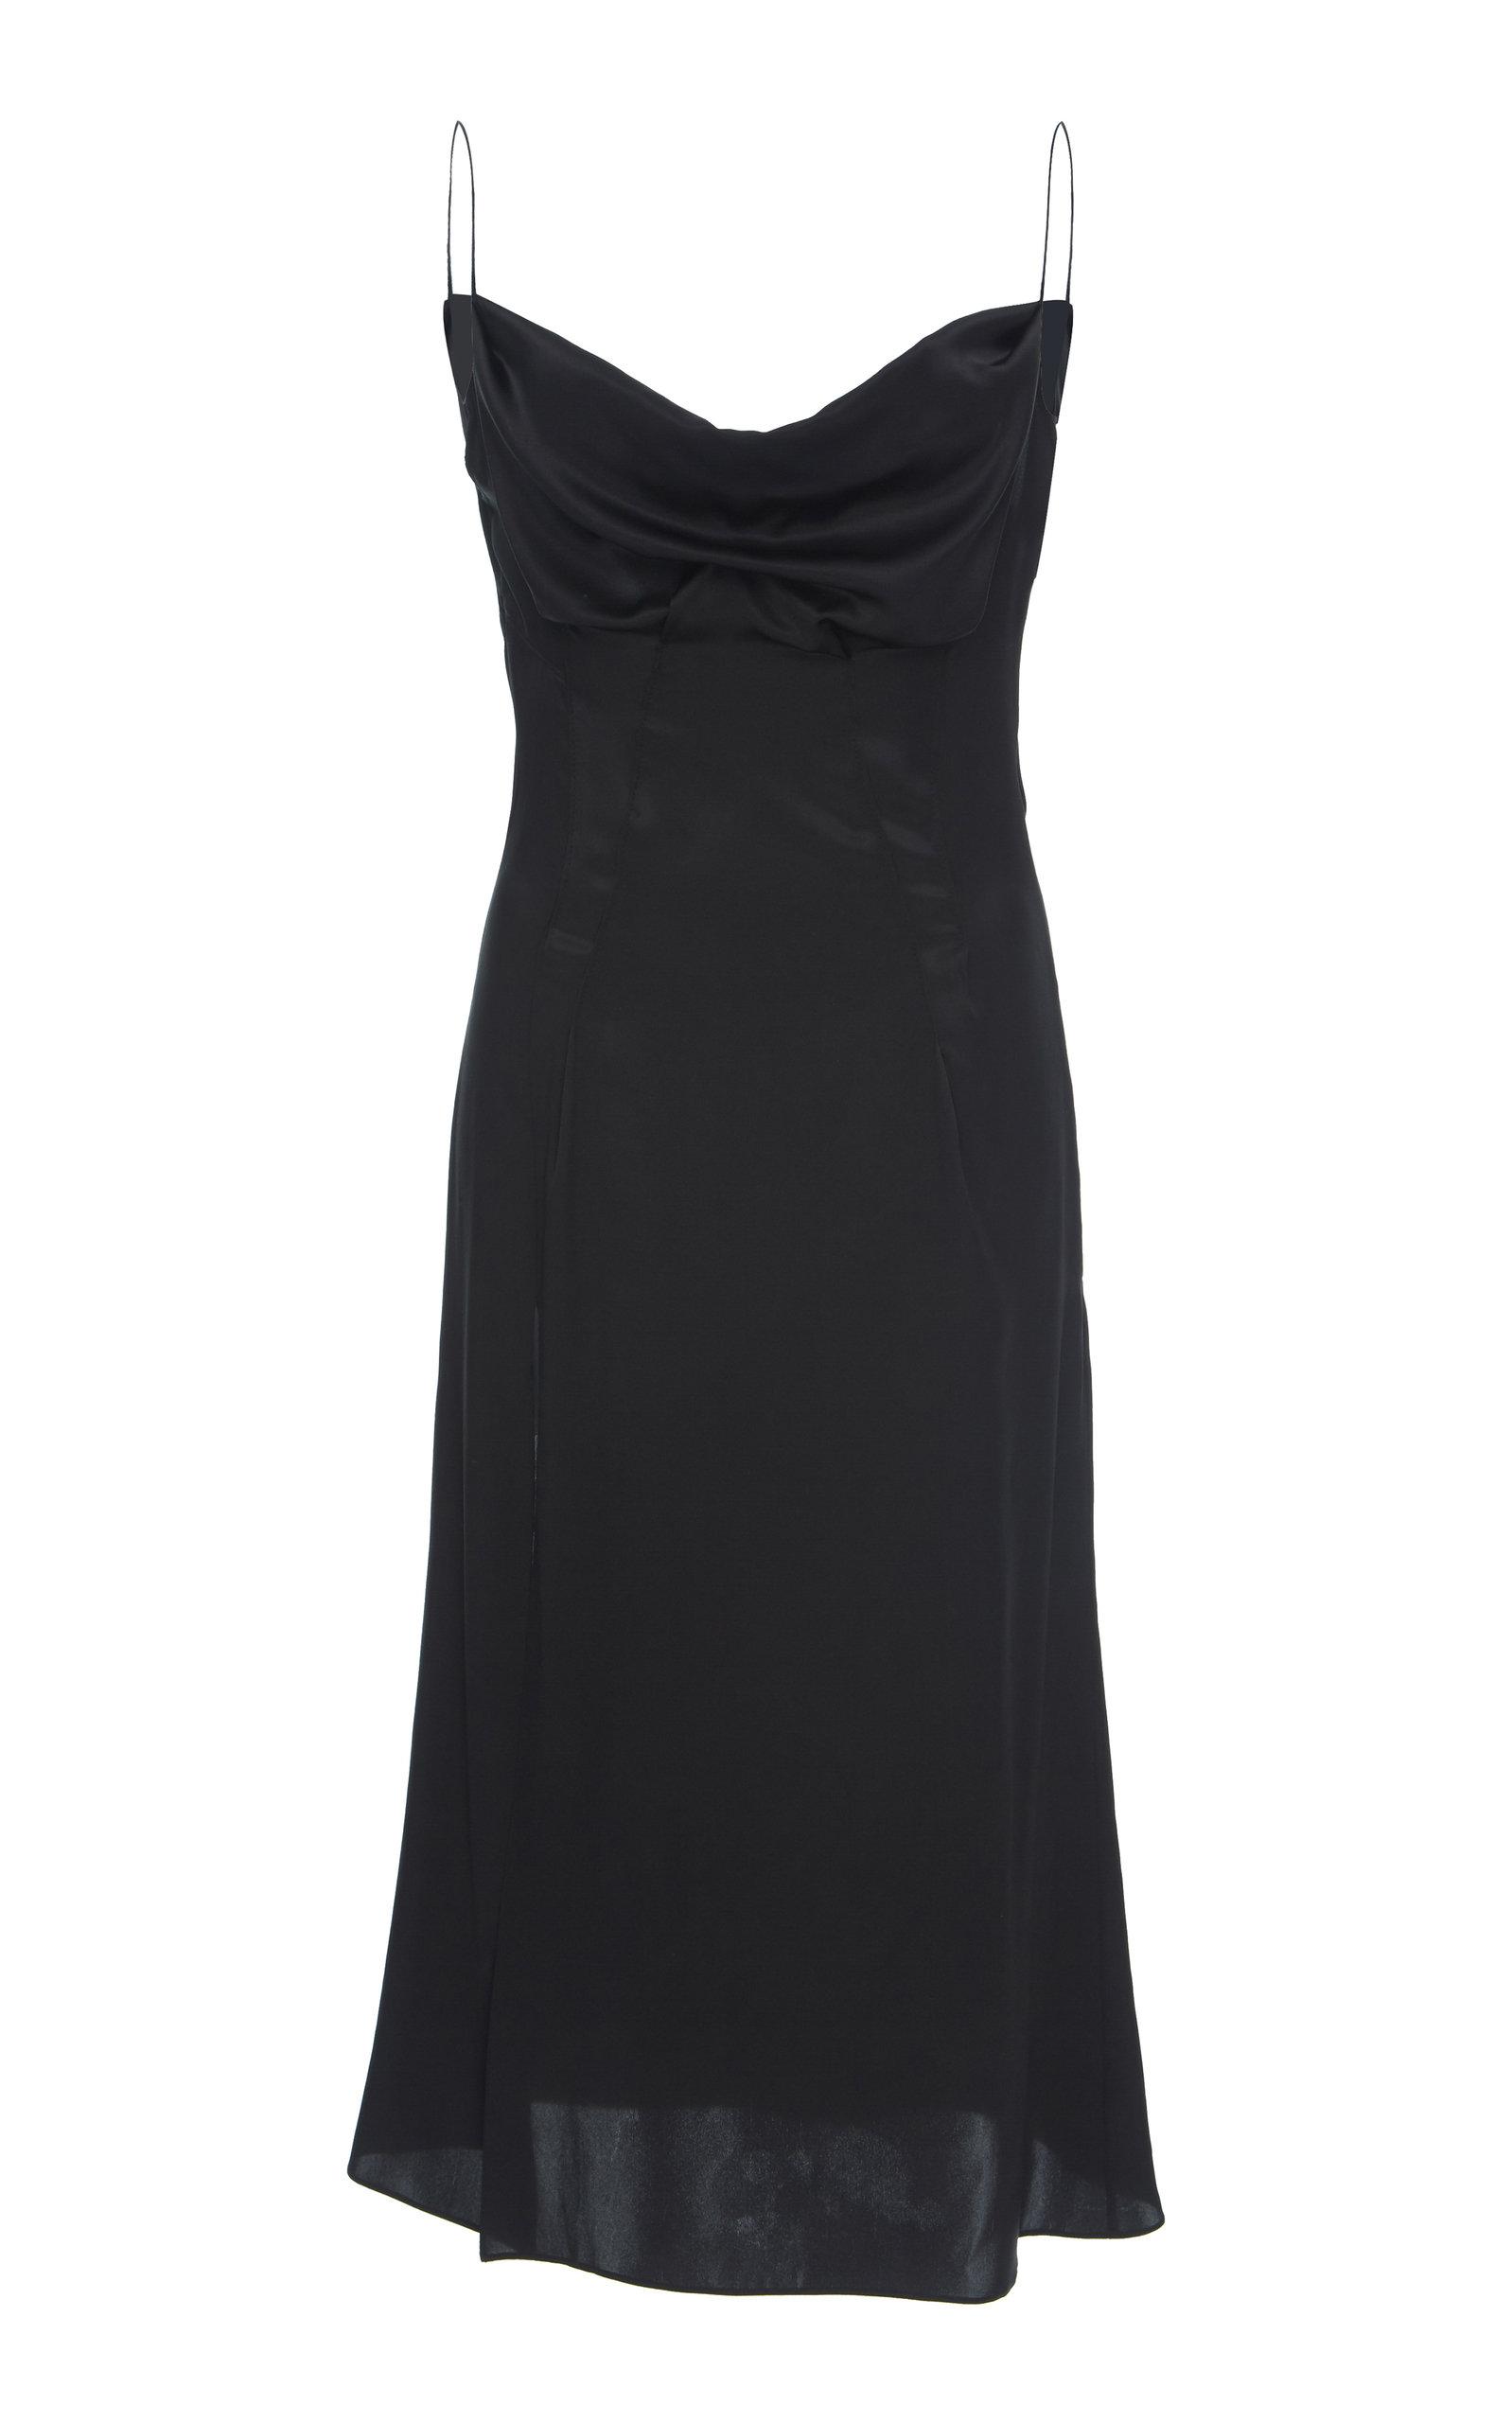 79869ca9736 Versace Clothing Dress